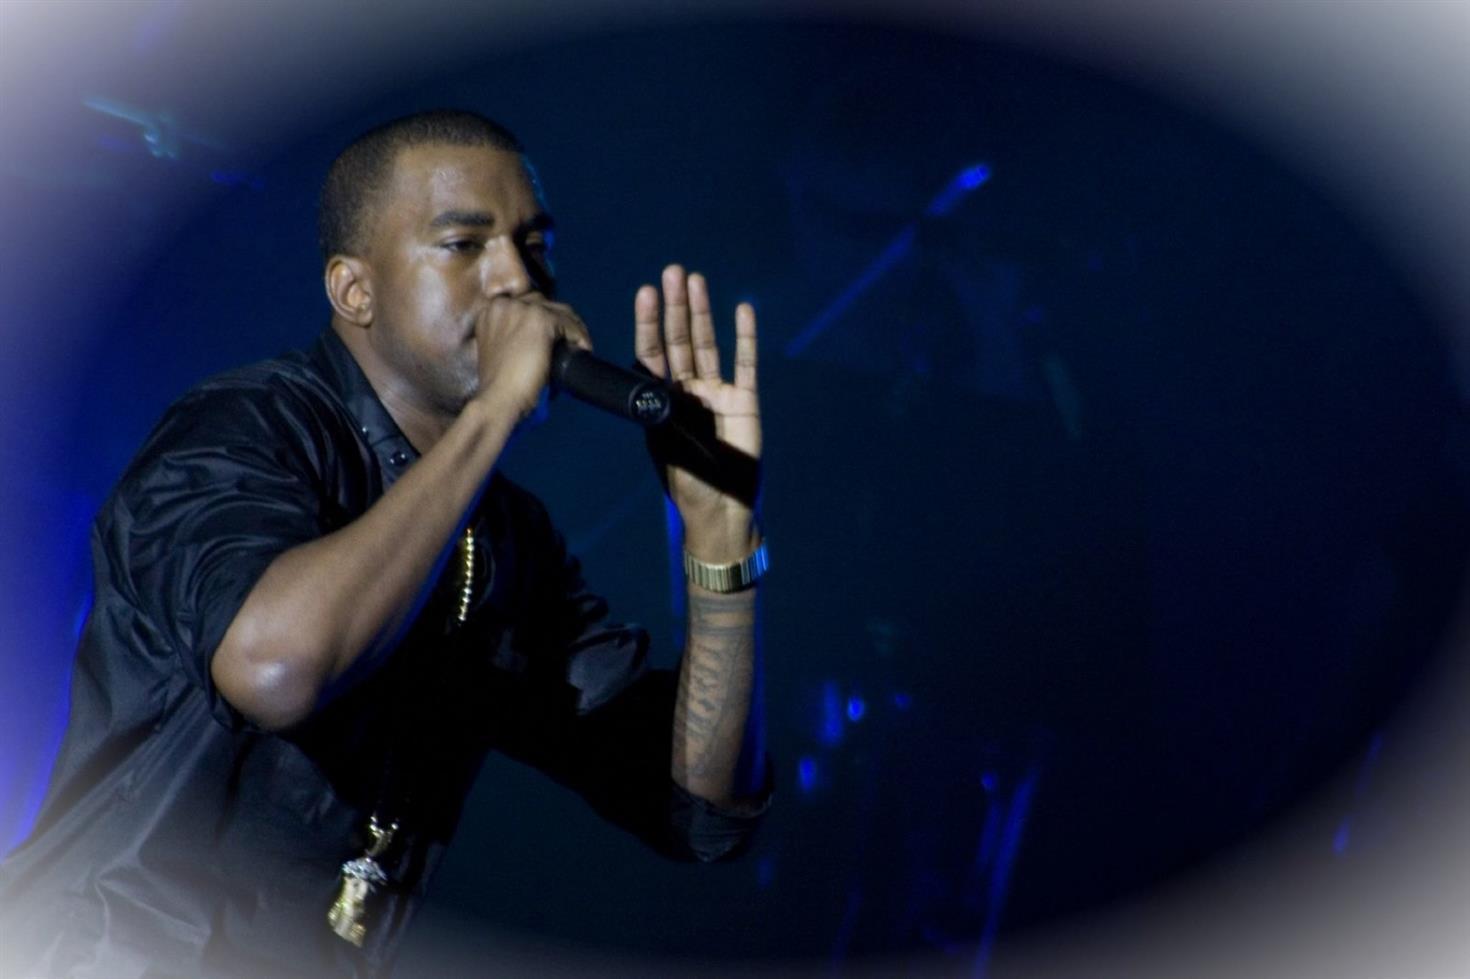 Kanye West Irina Shayk La prossima grande cosa Kim KardashiangOWuJKR0 1